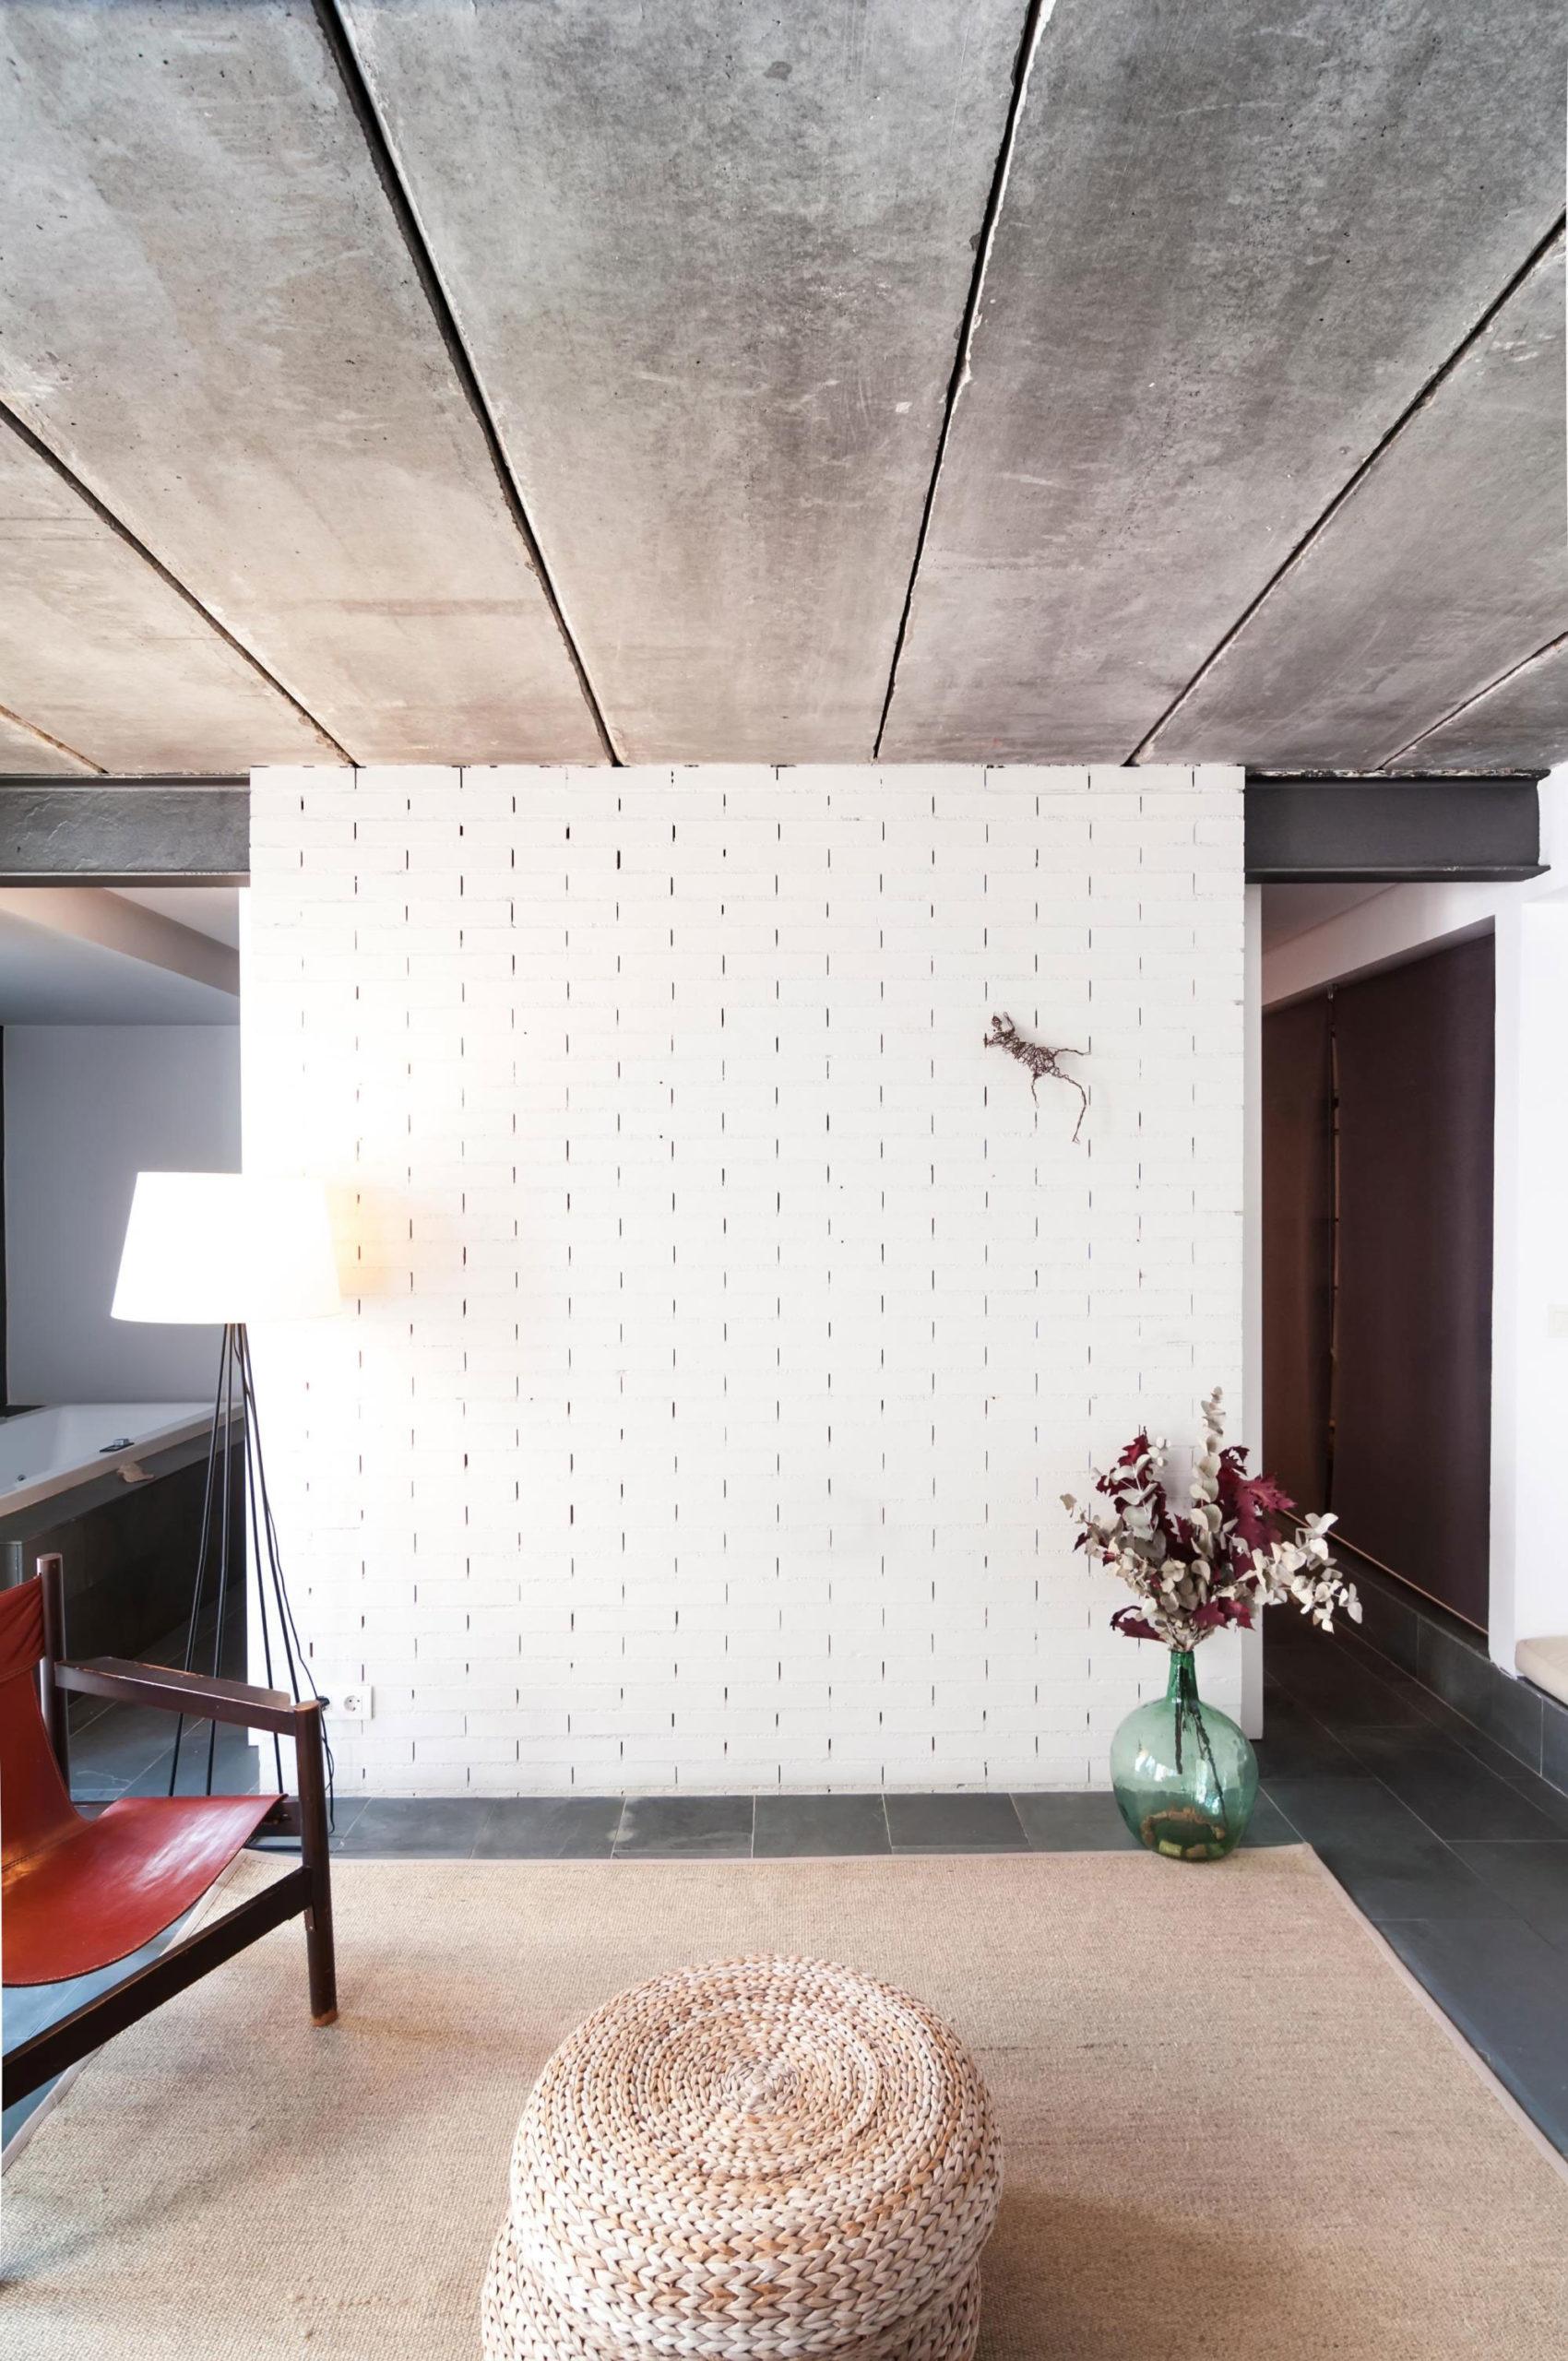 Dúplex Alicante. Diseño interior. eneseis Arquitectura